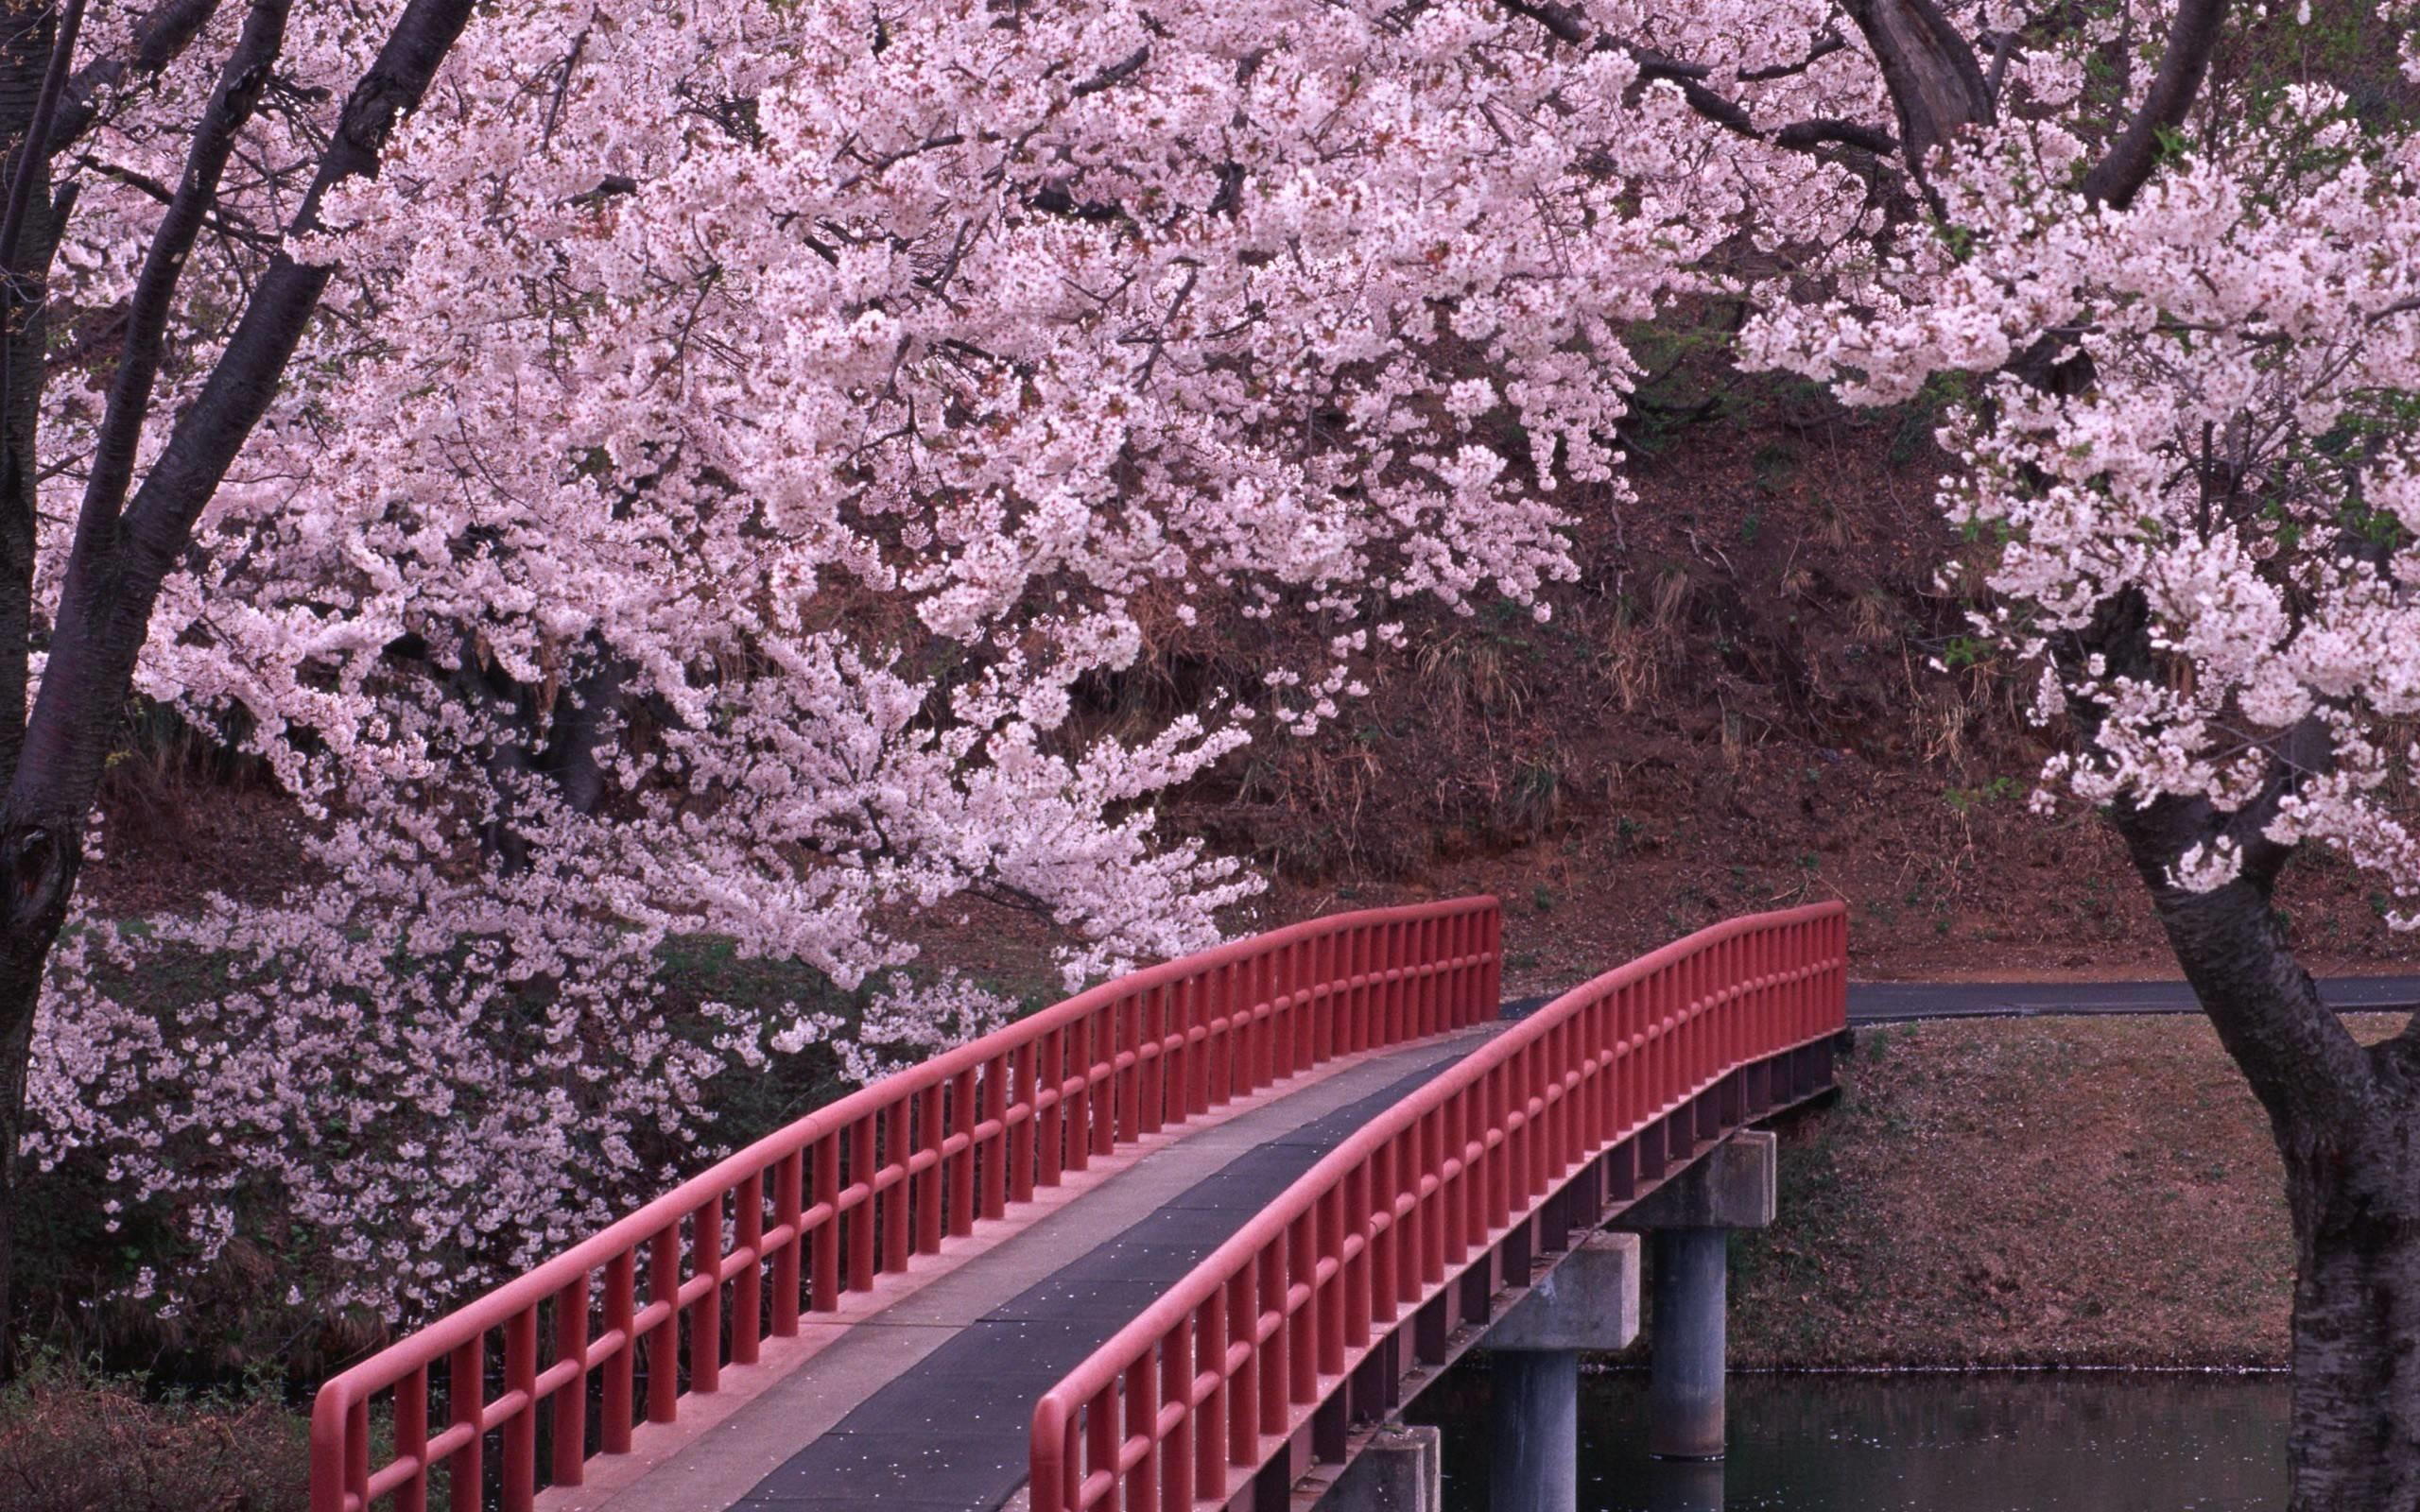 Cherry Blossom Tree Gallery Wallpaper – HD Wallpapers|WallForU.com